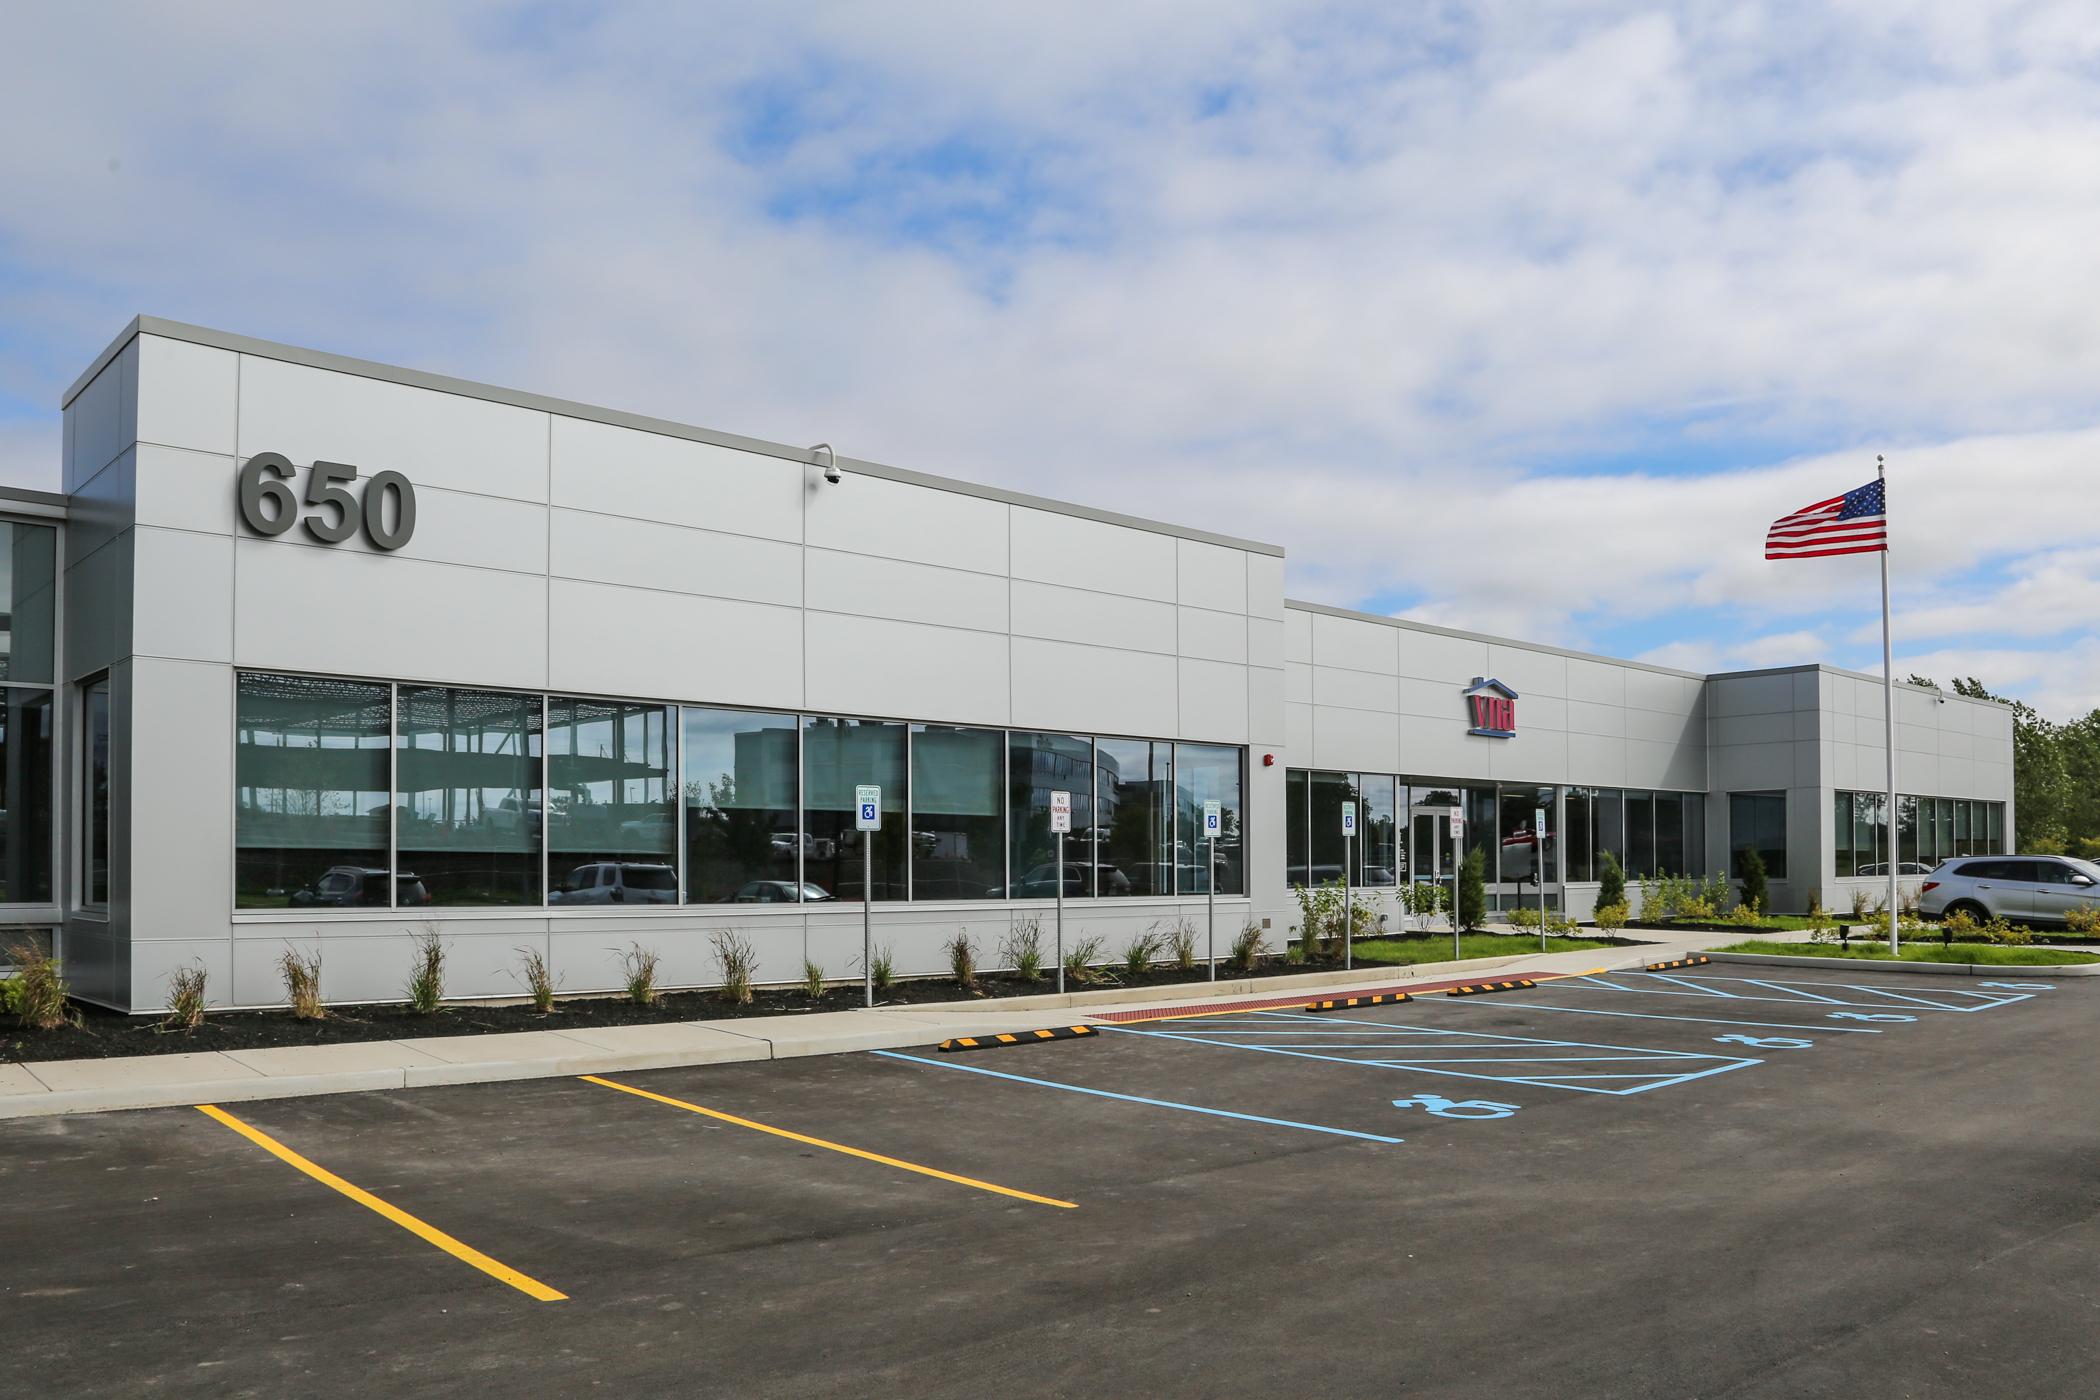 VNA Headquarters at 650 Airborne Pkwy.